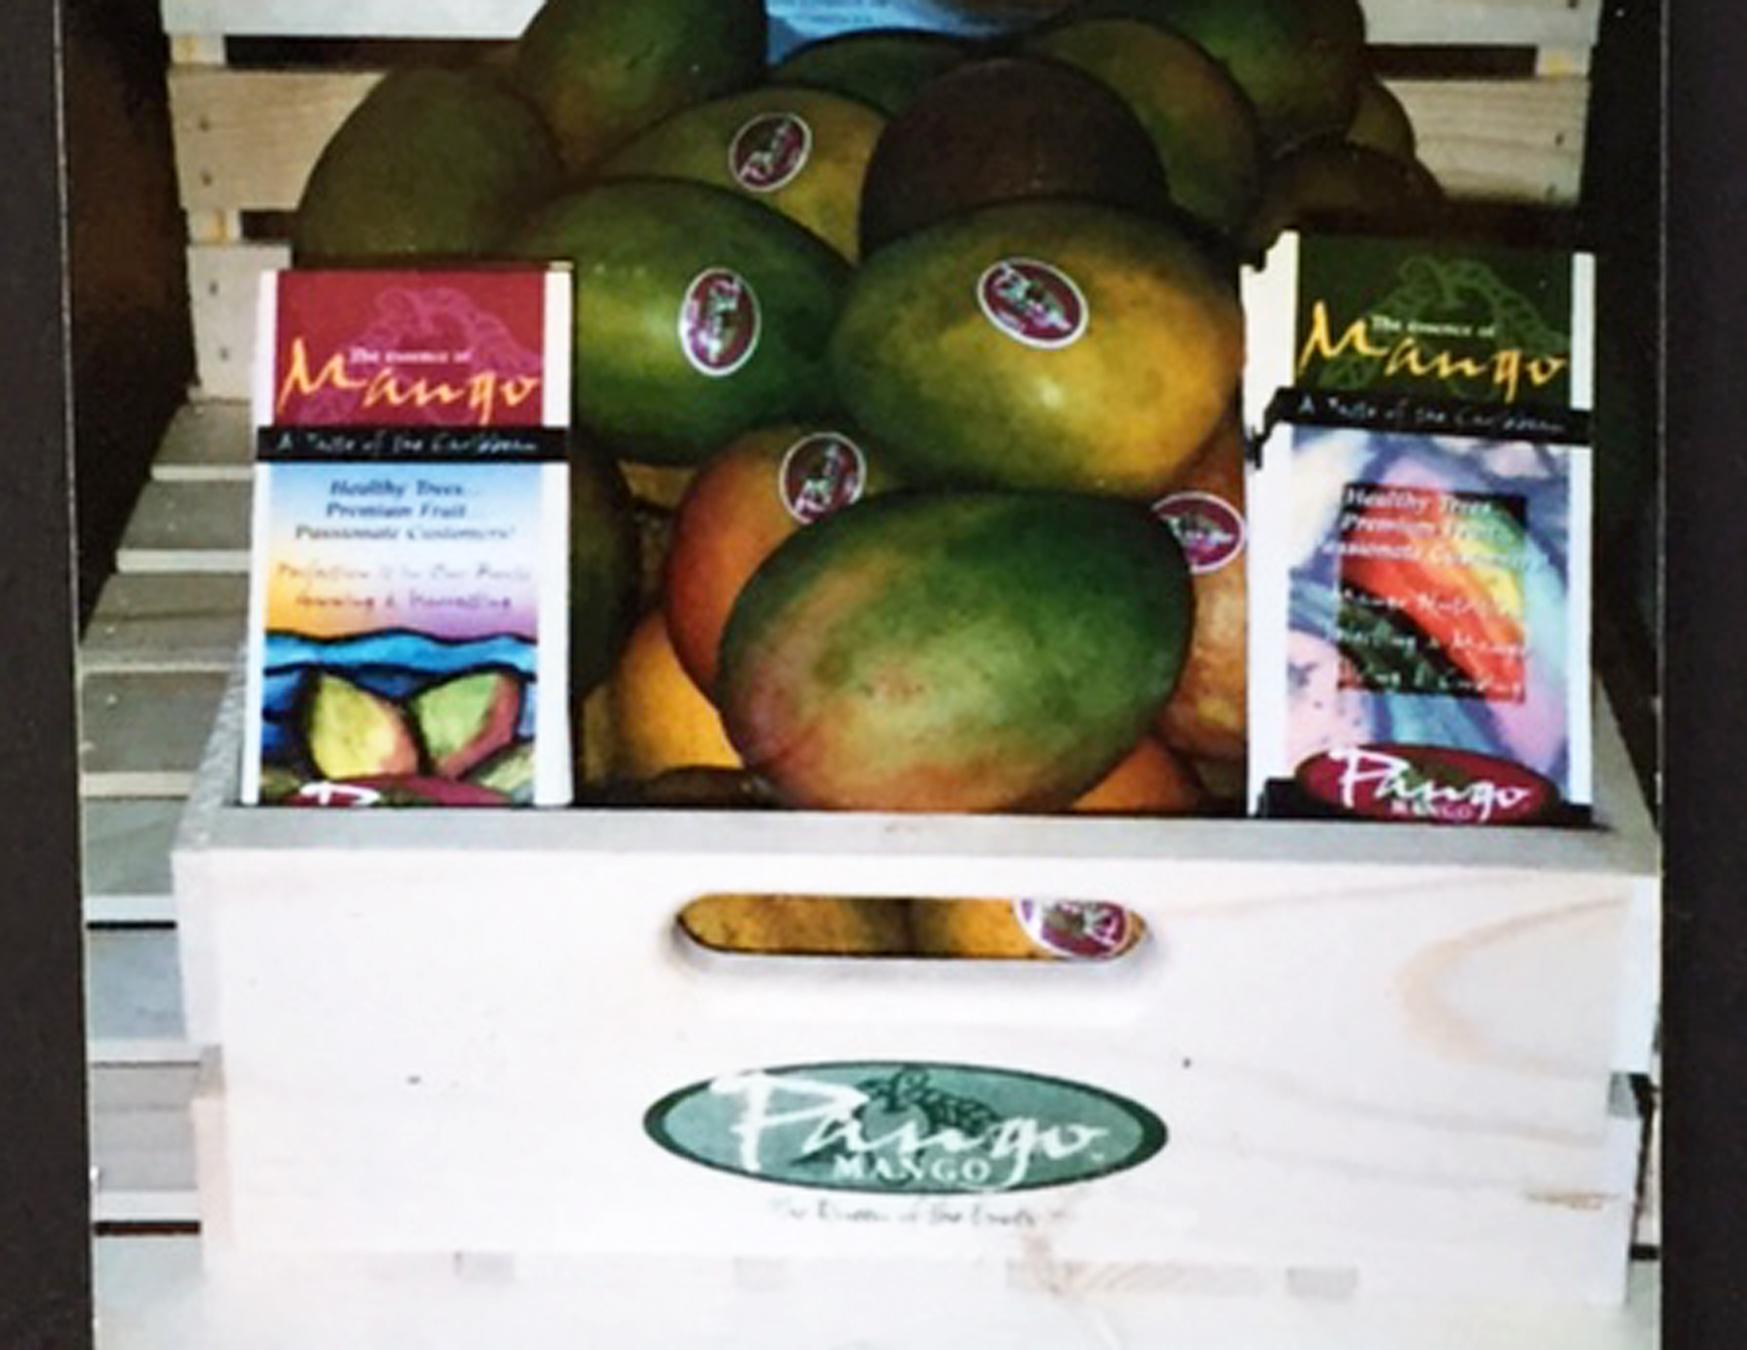 WoodenBox-Mangos.jpg